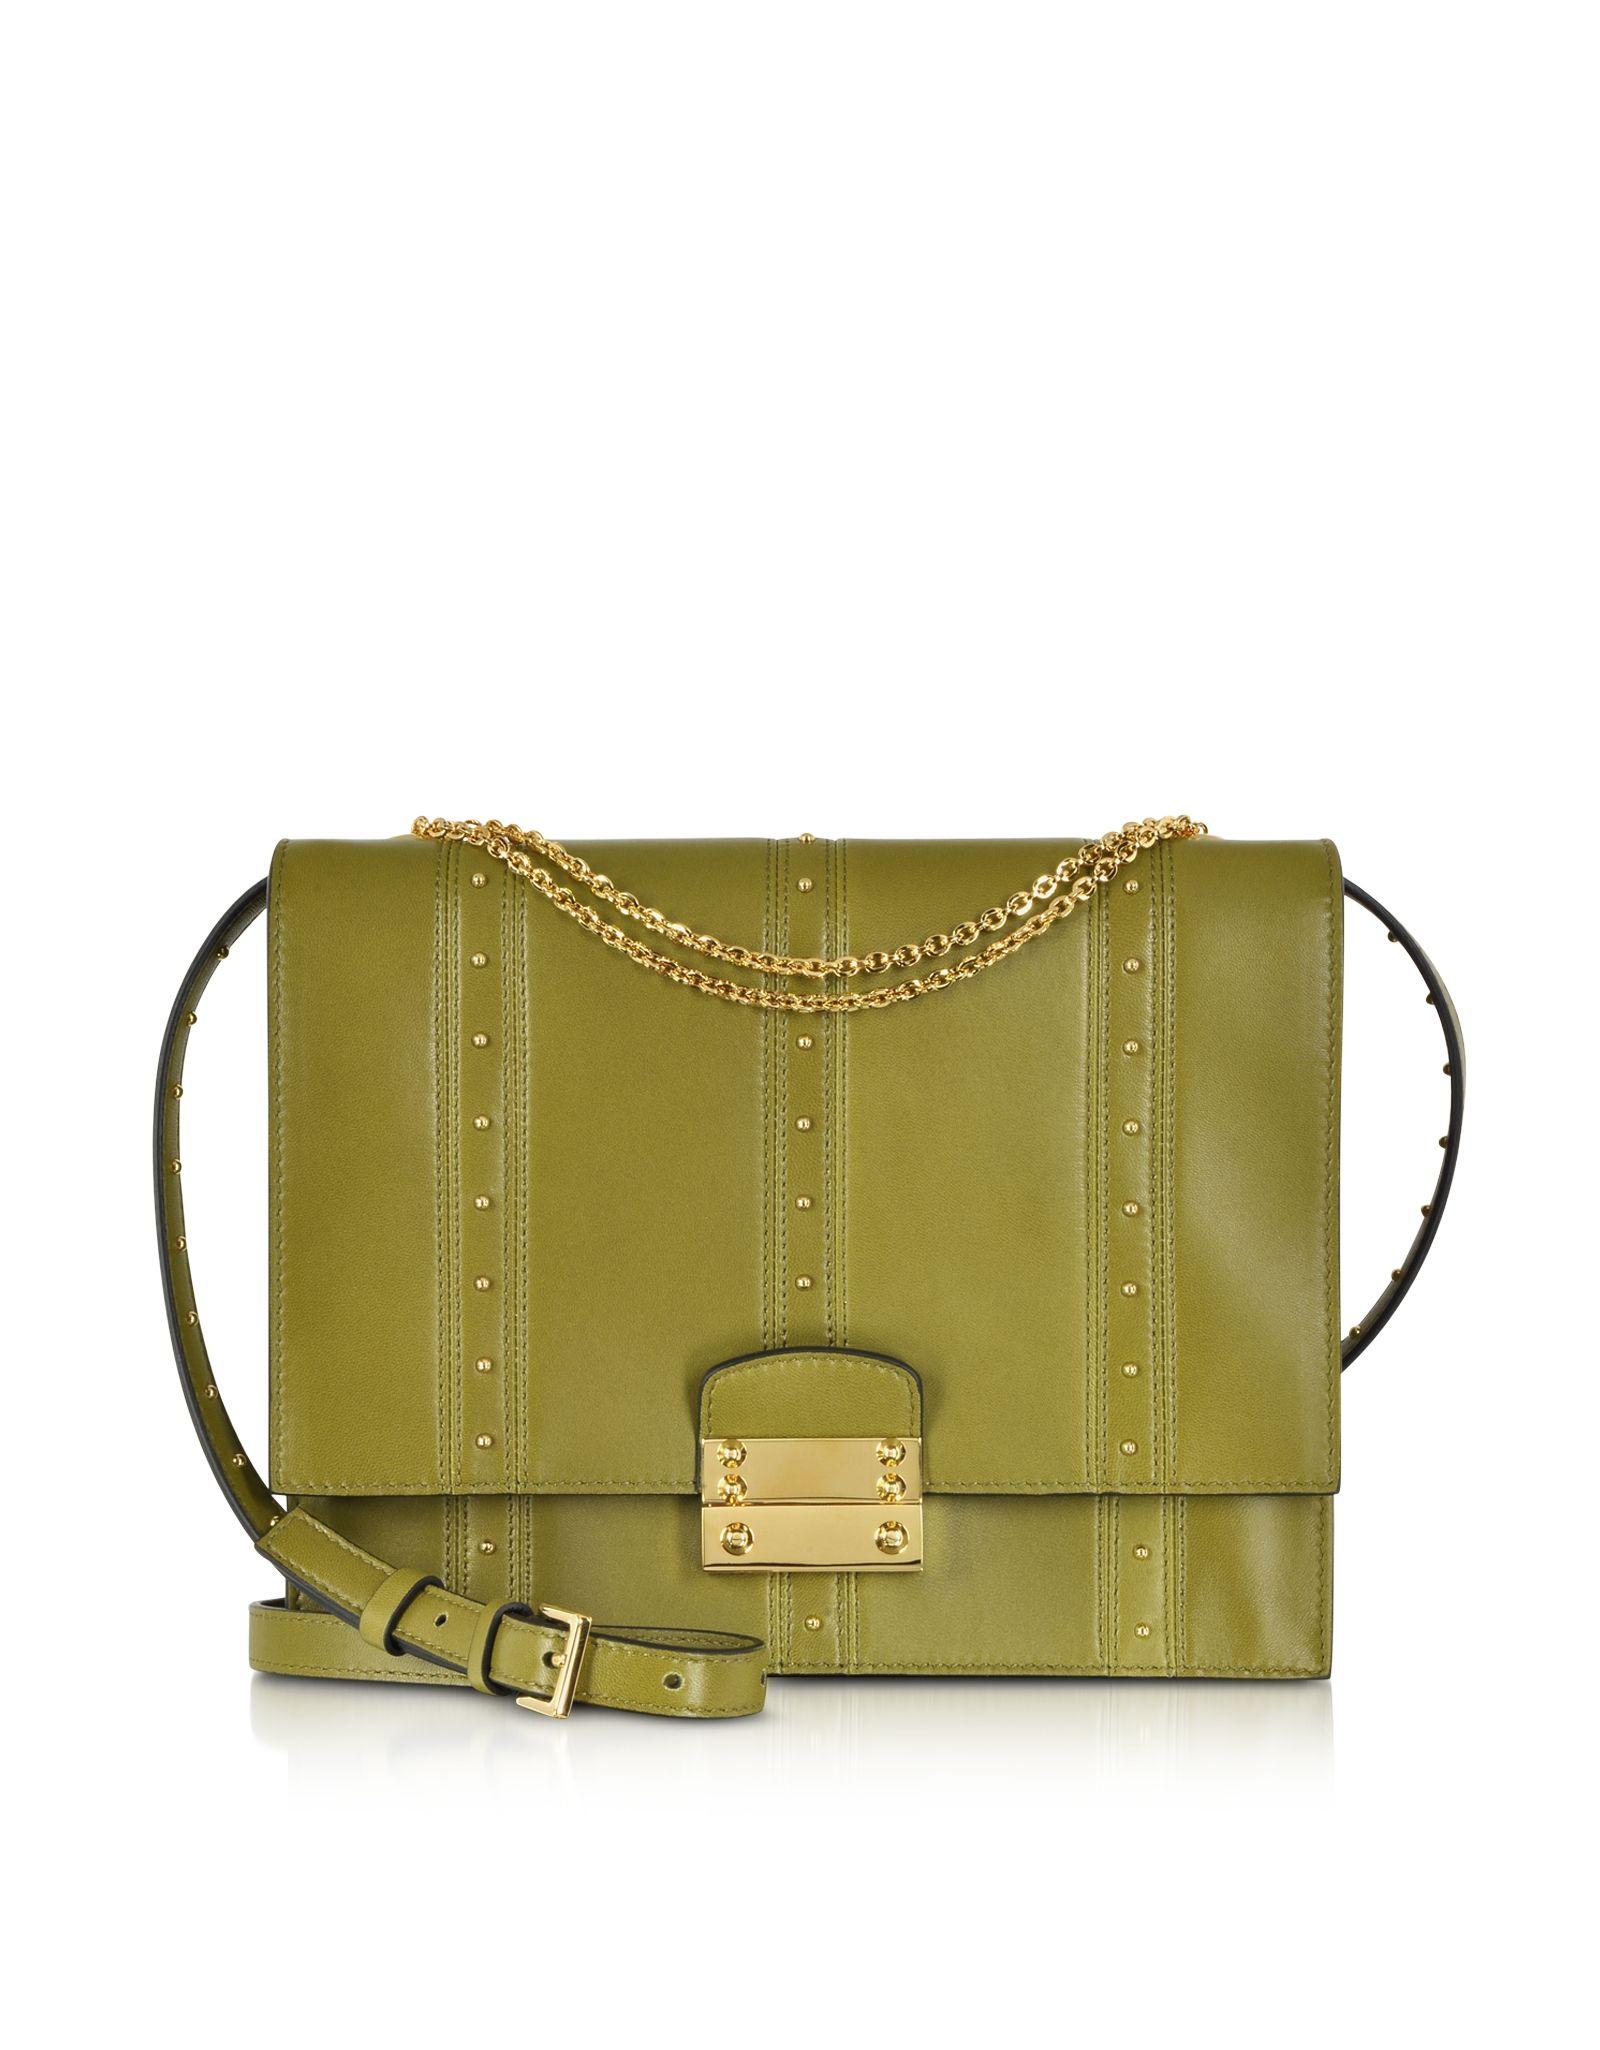 533686b5ef6f Valentino Olive Green w Gold Studs Shoulder Bag at FORZIERI